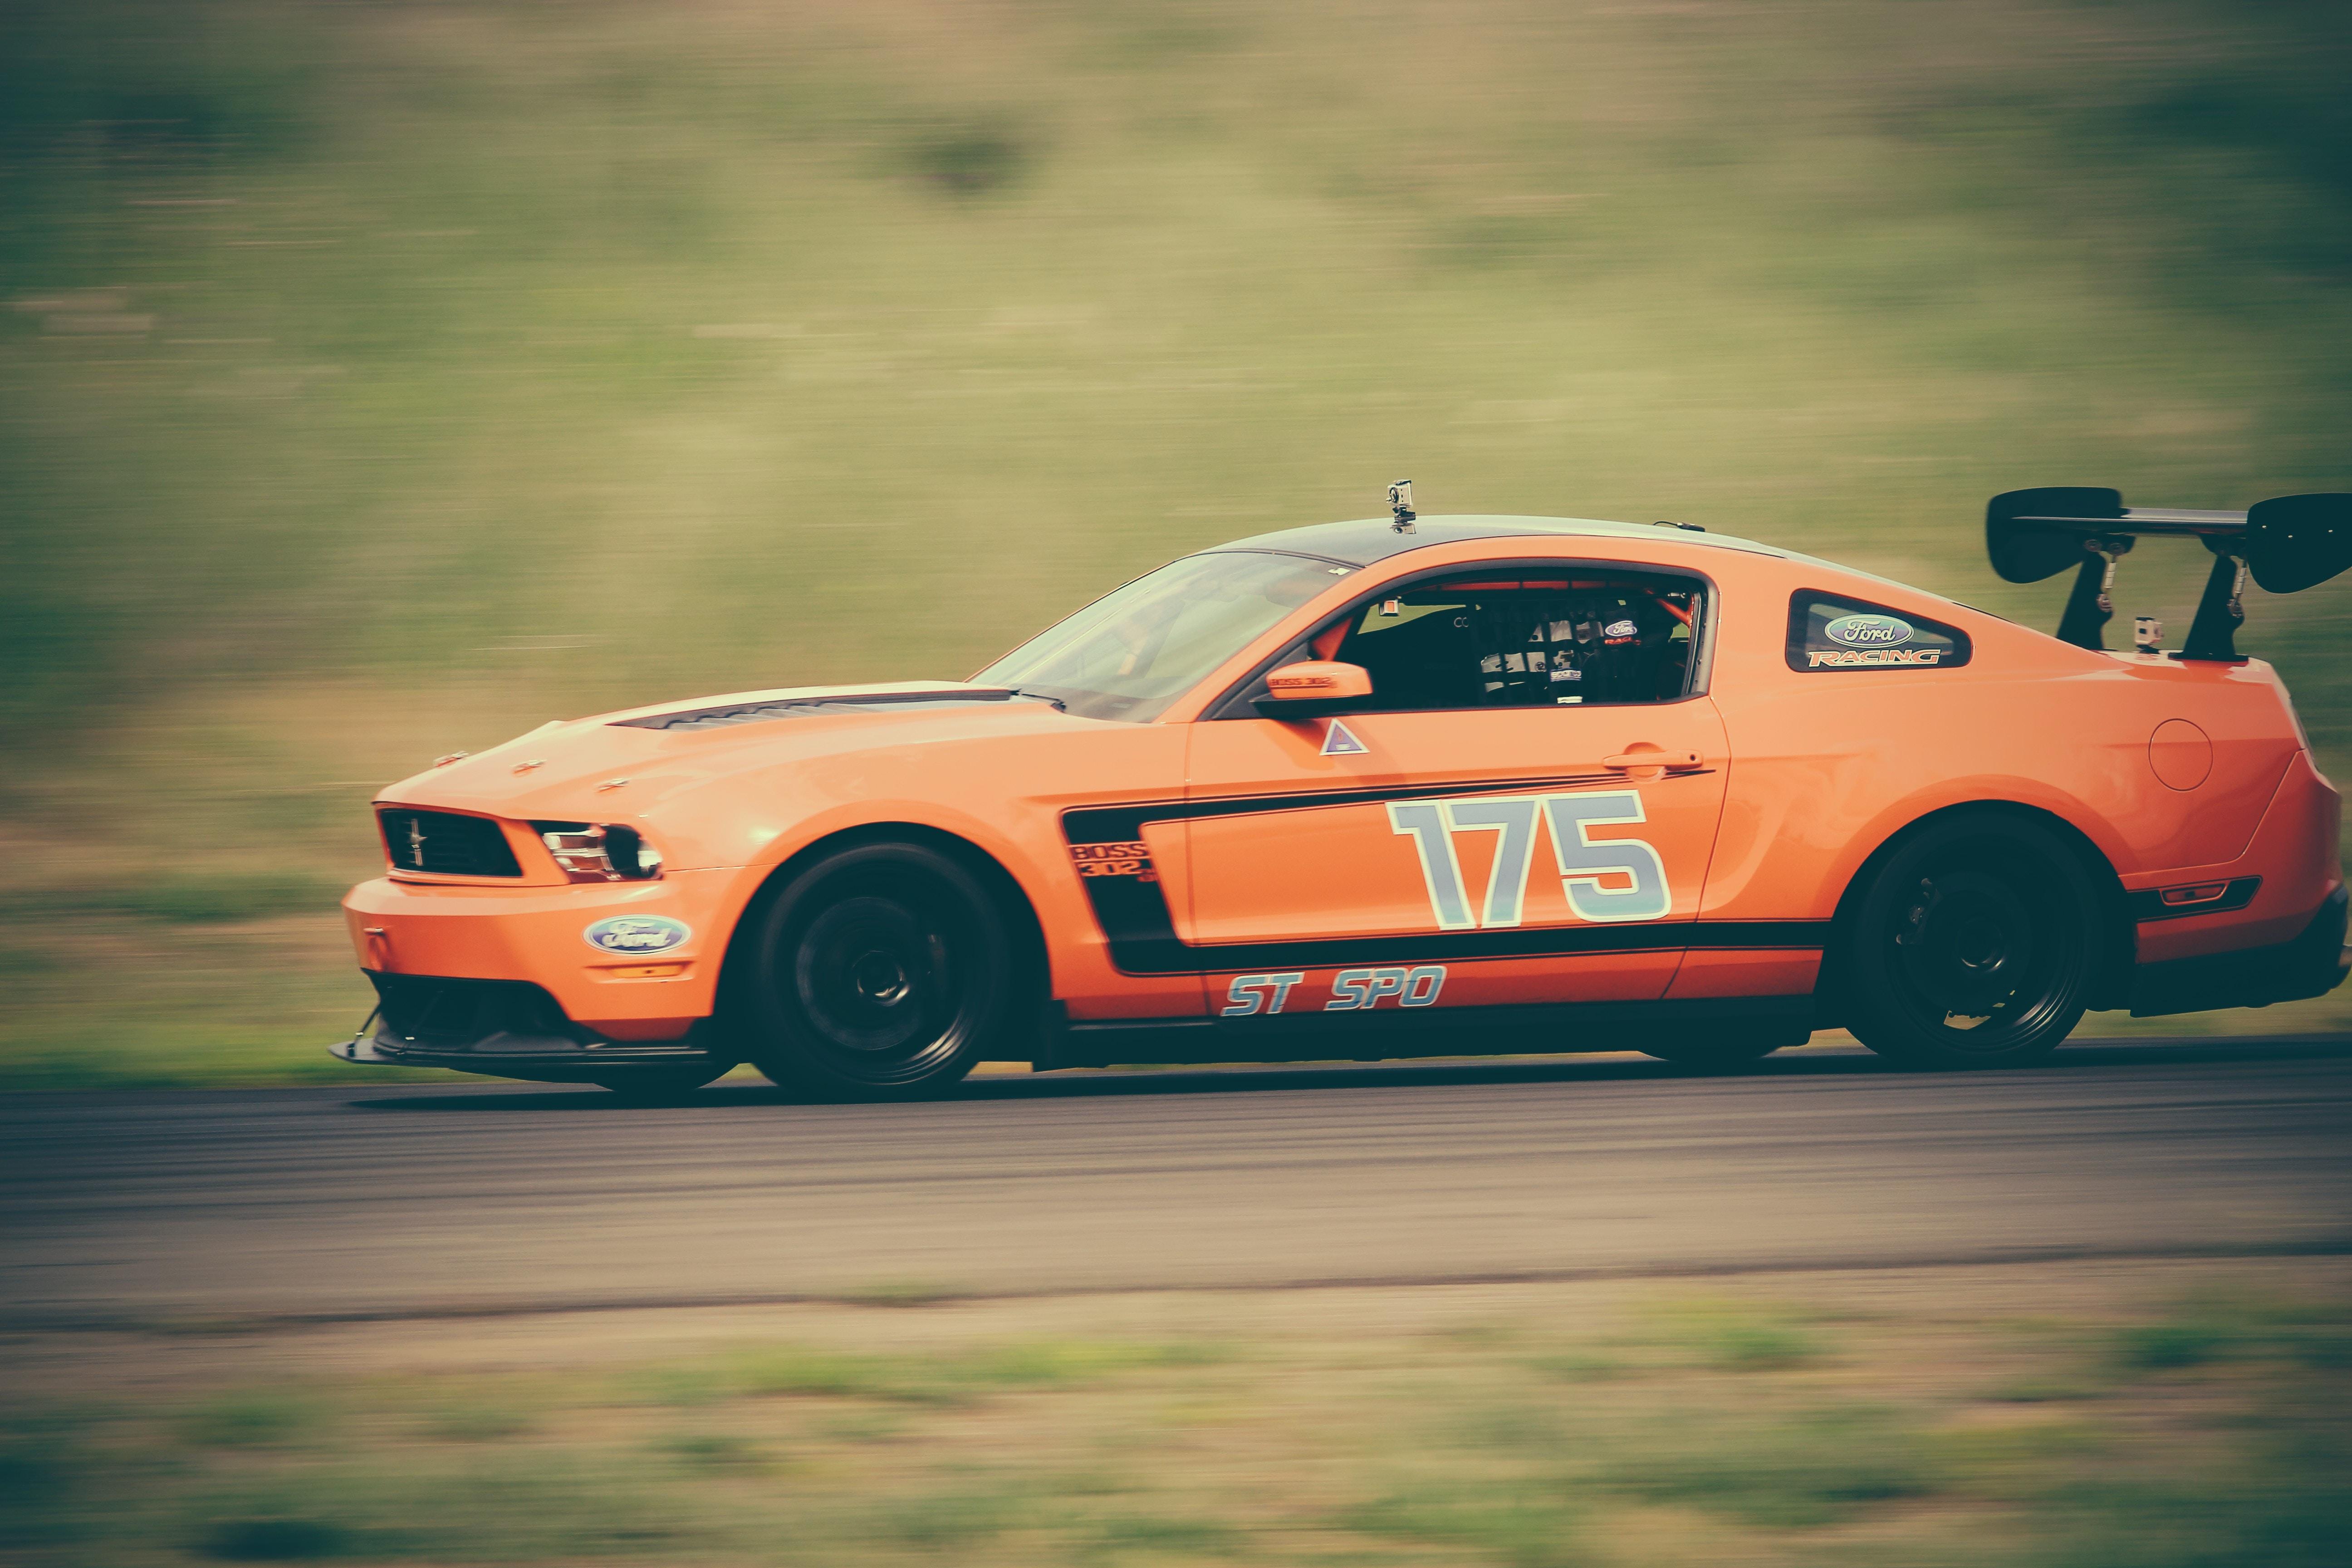 panning photography of orange racing car on road